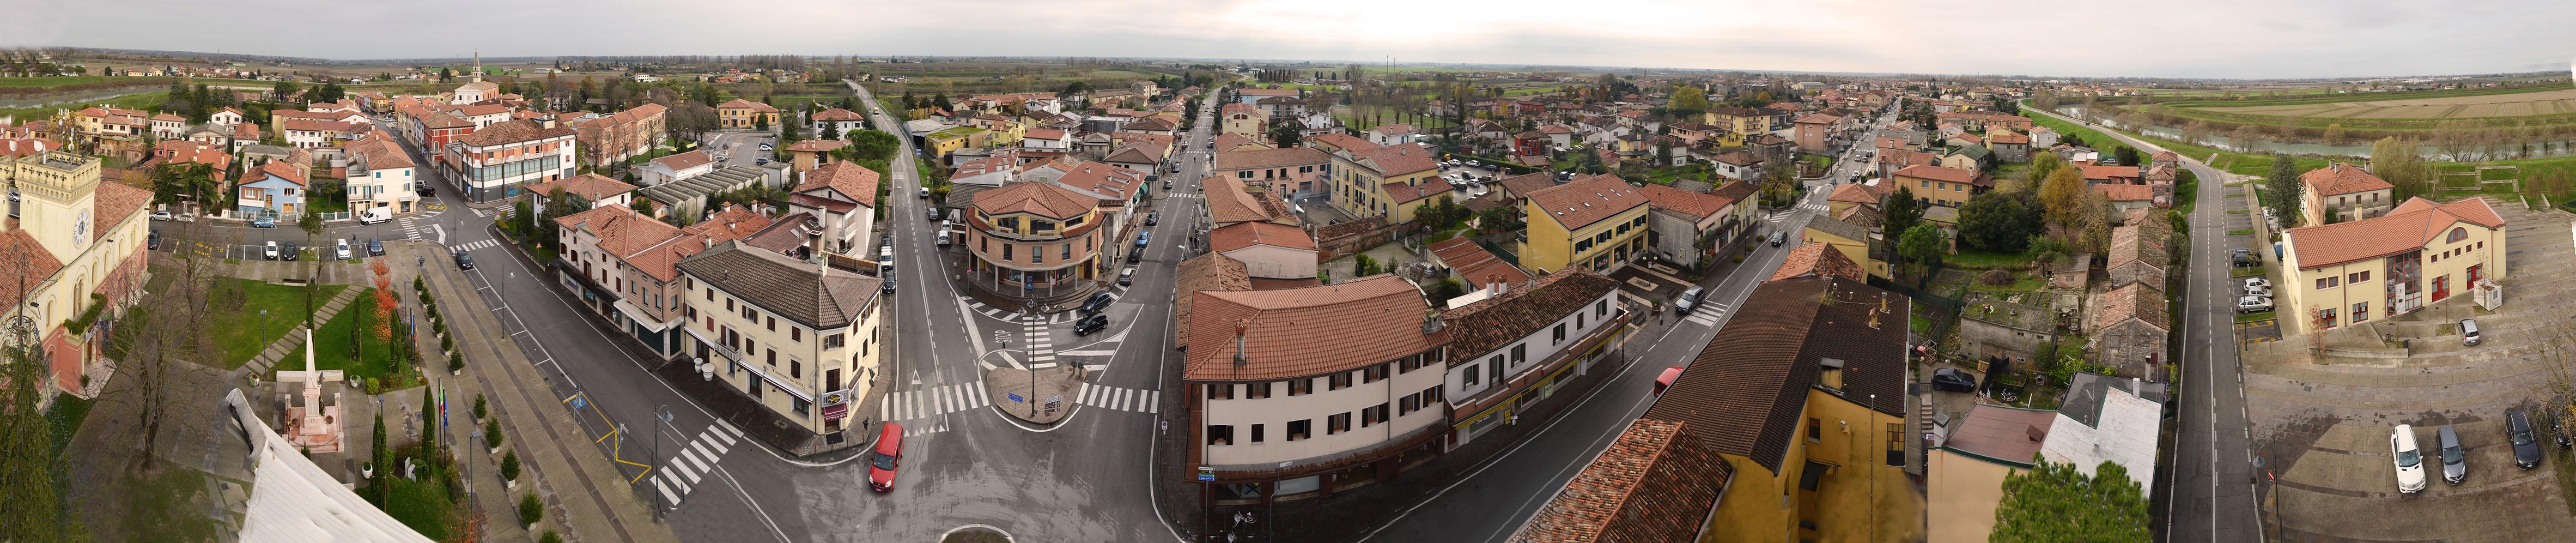 Giuseppe Ave